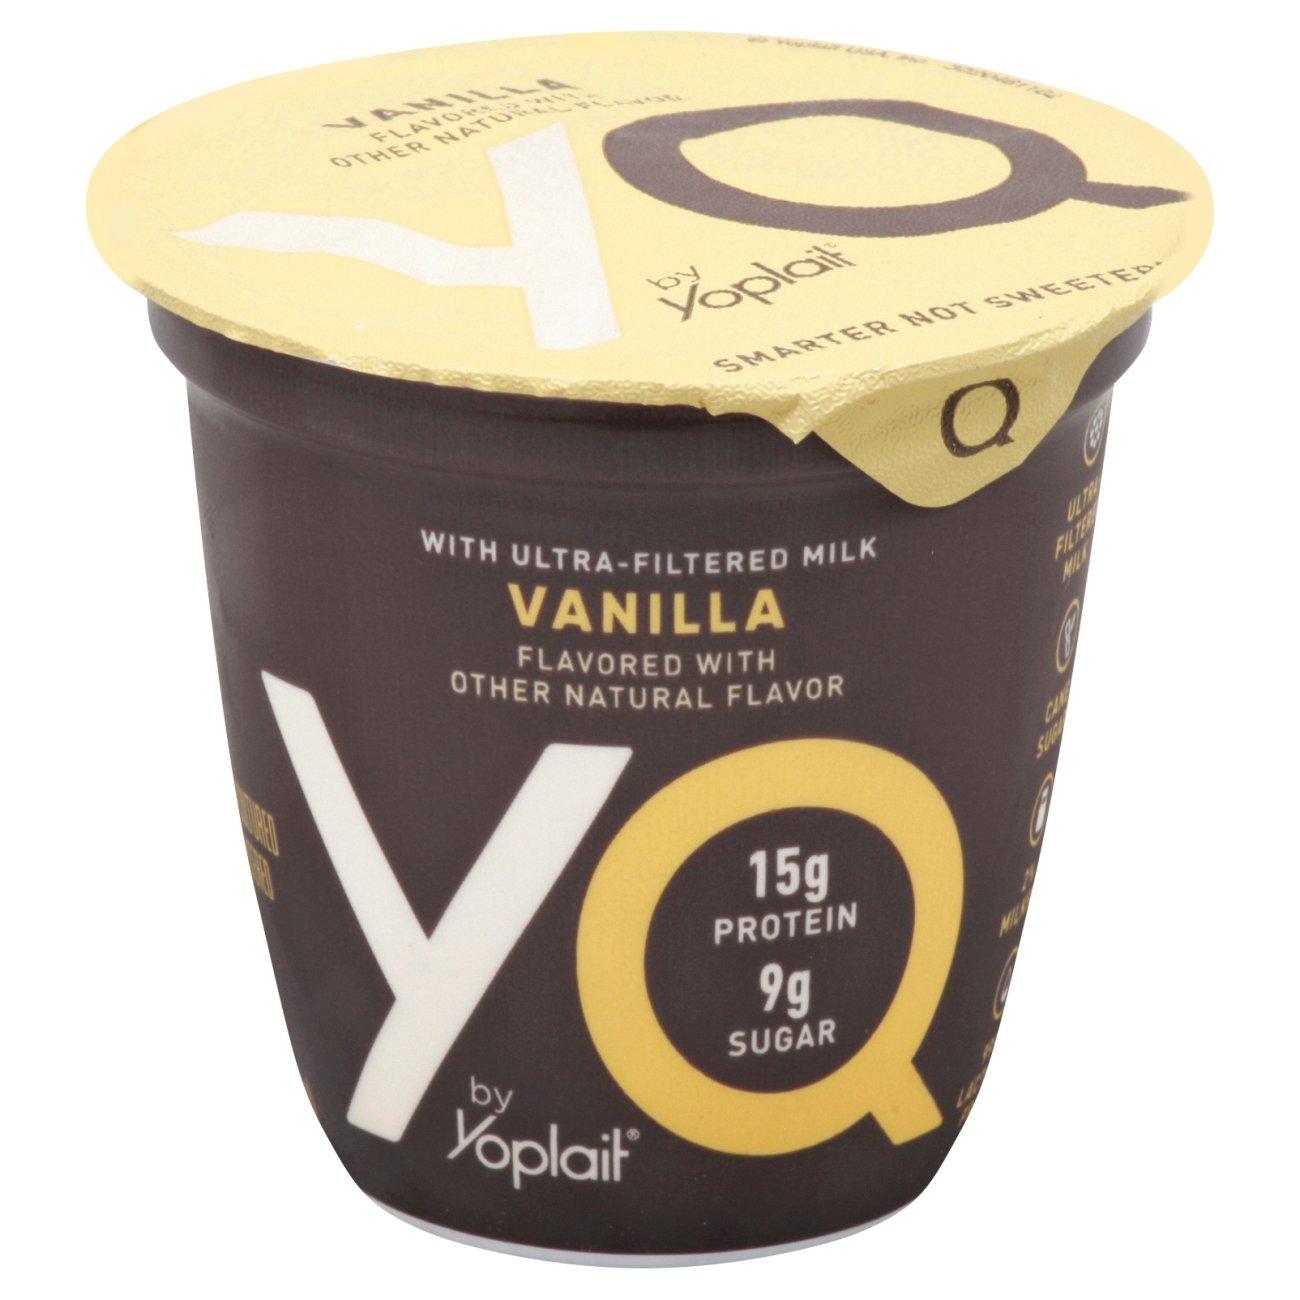 Yoplait YQ Ultra-Filtered Milk Vanilla